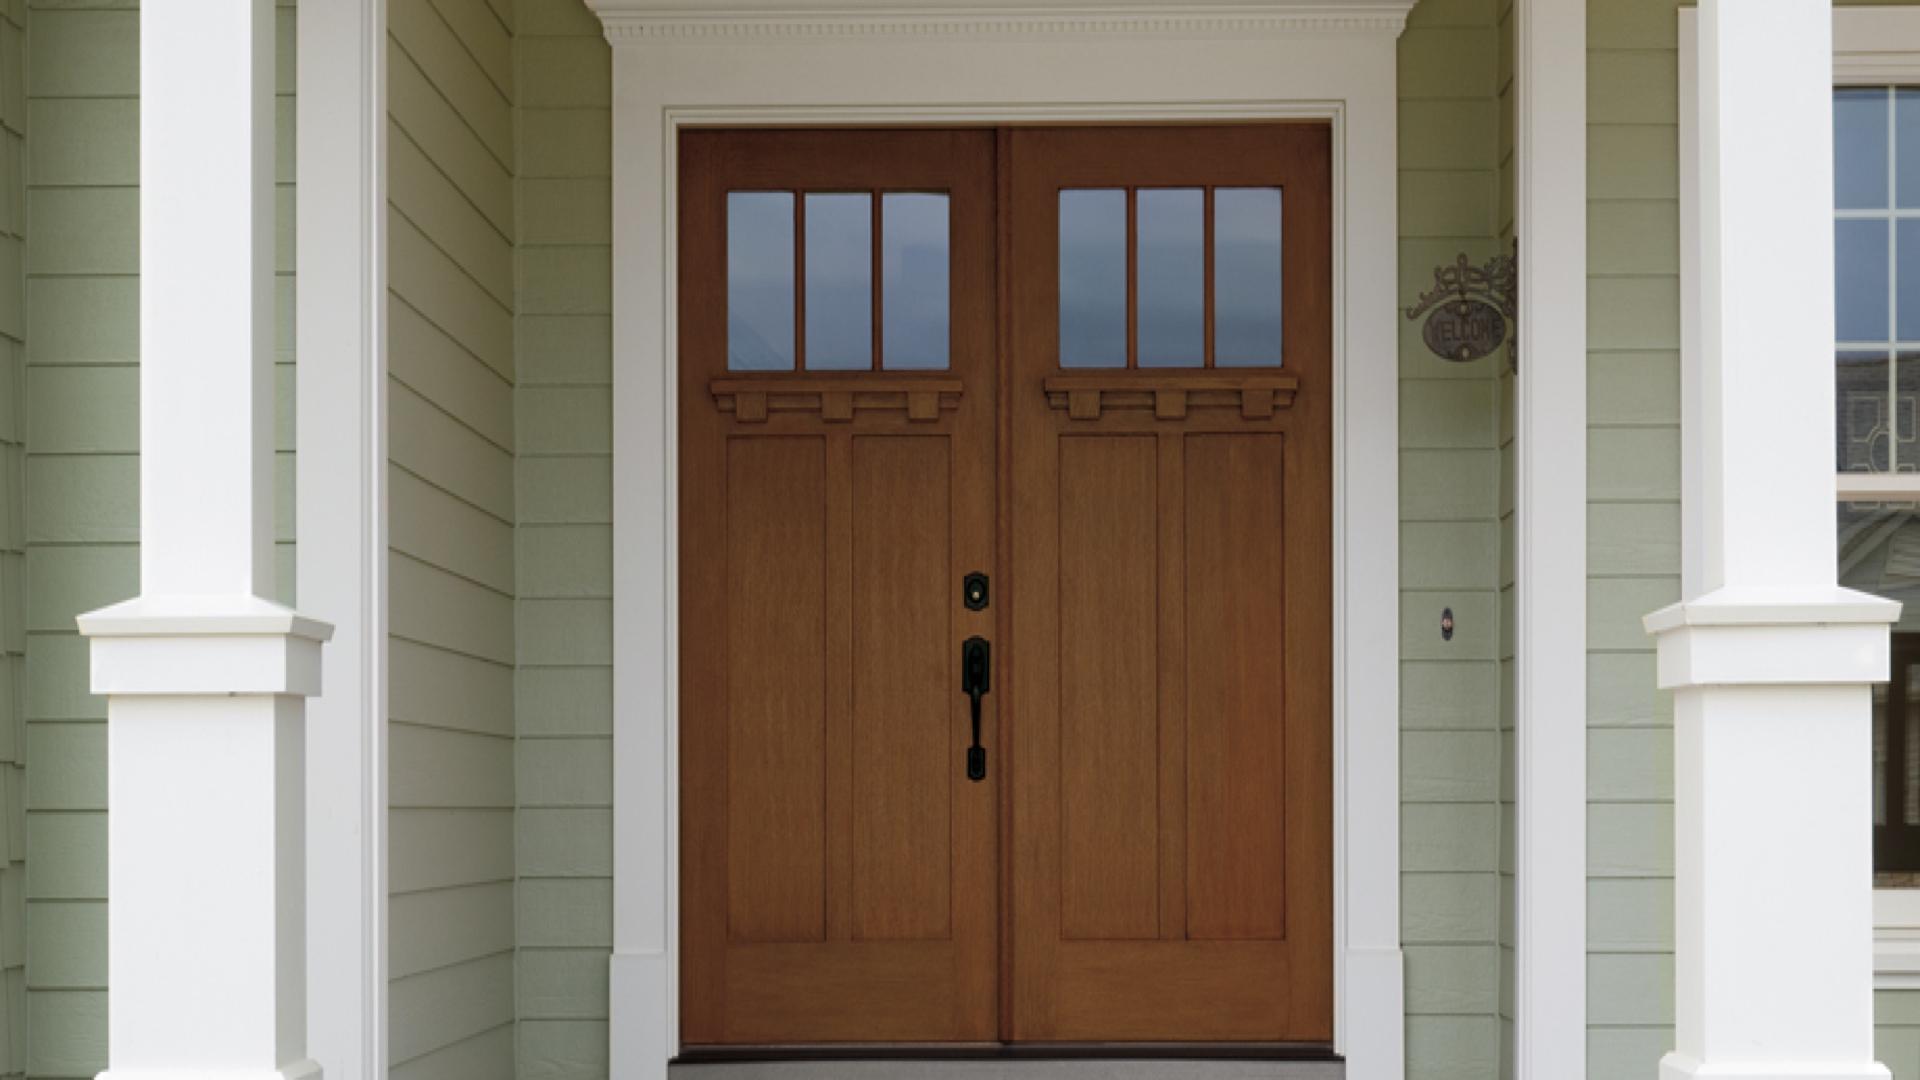 Pella bow window replacement windows and replacement doors for Pella doors